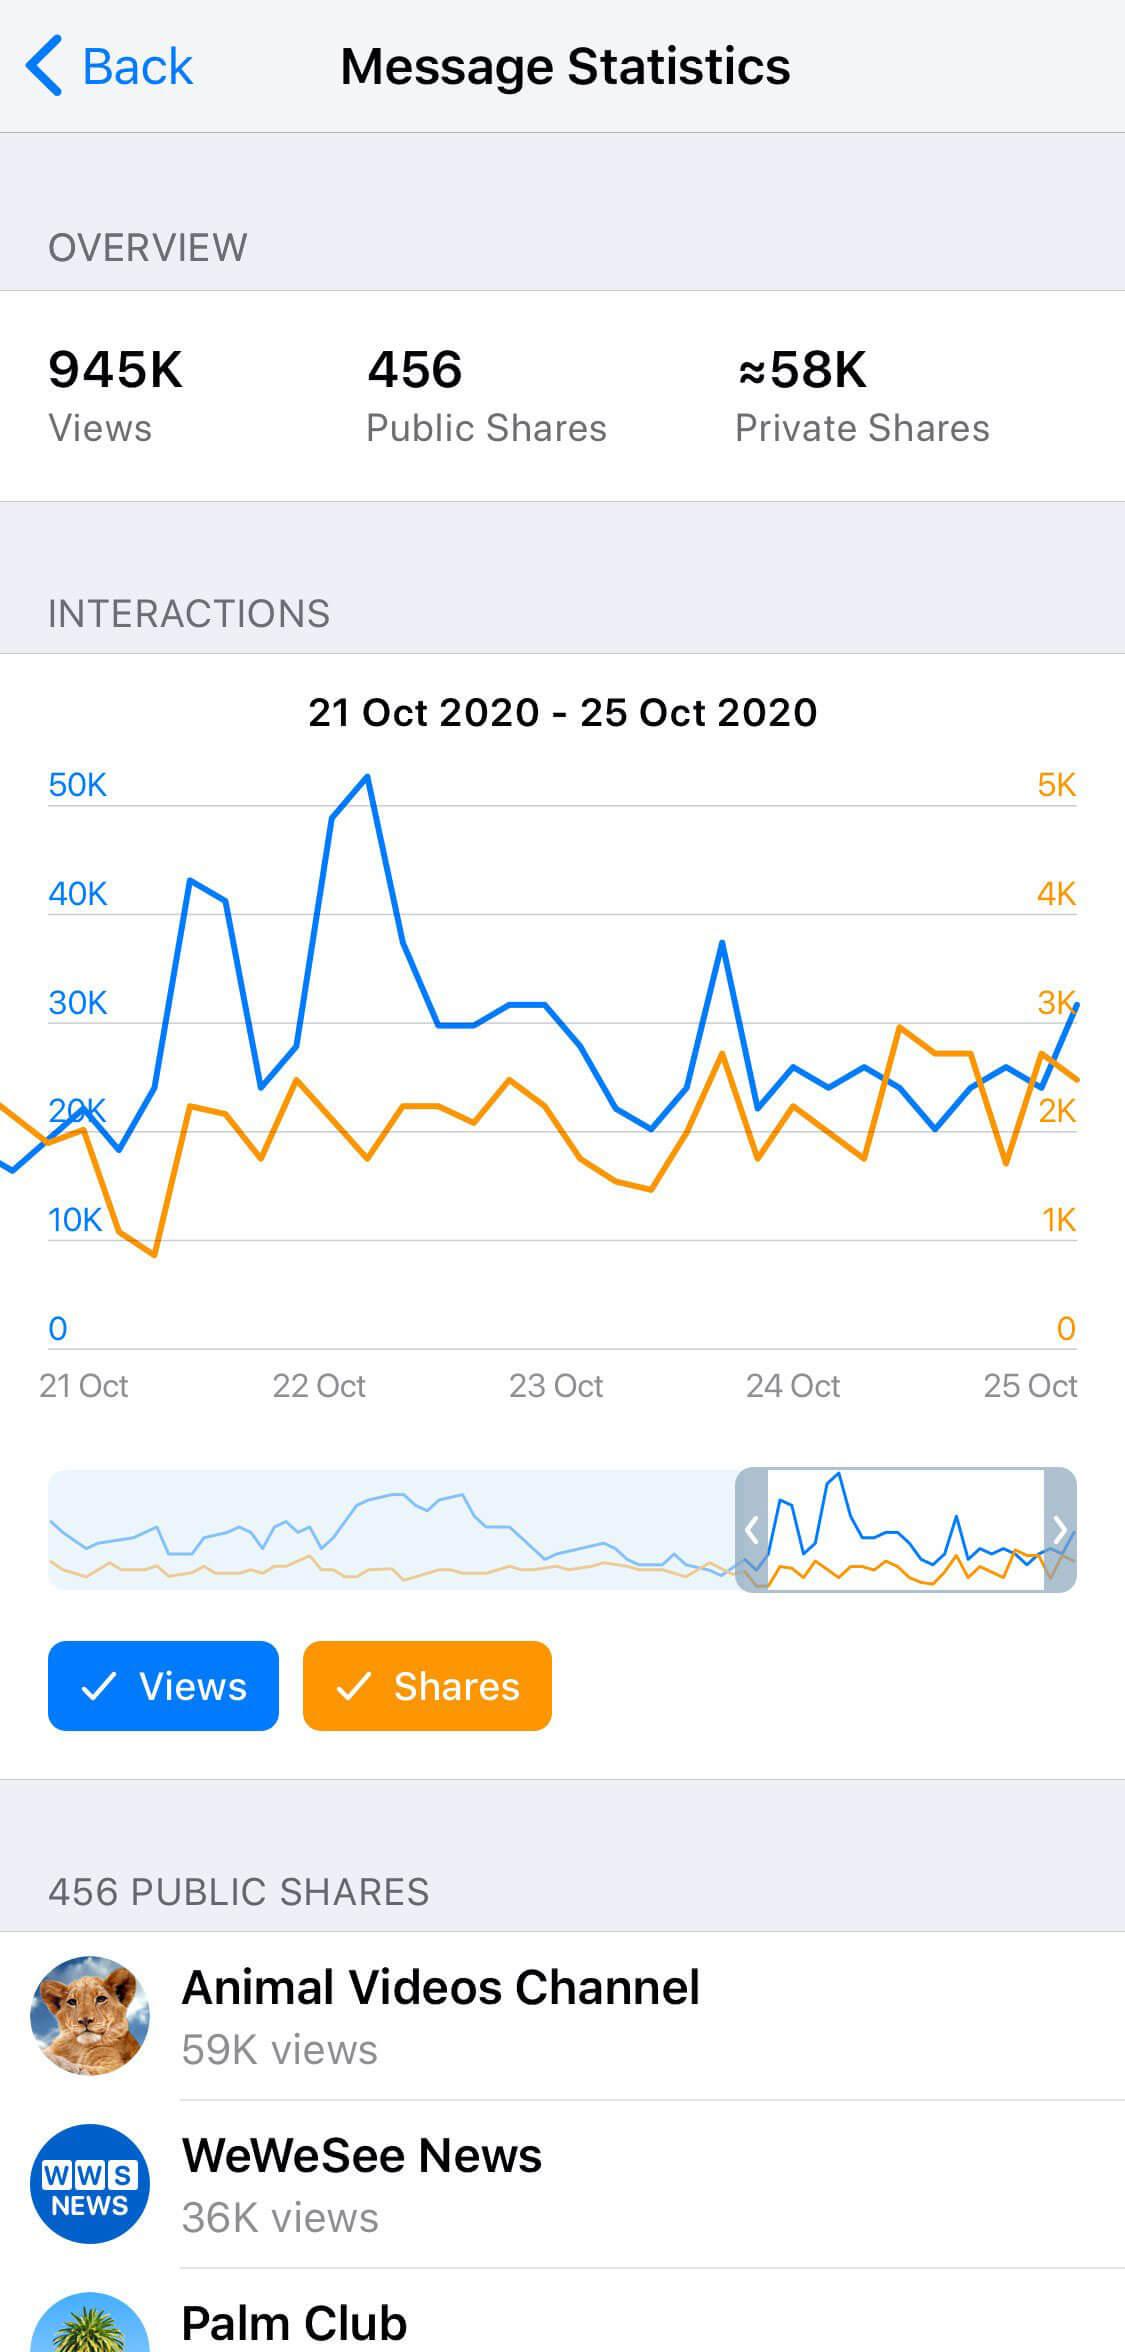 آمار پست کانالهای پیام رسان تلگرام